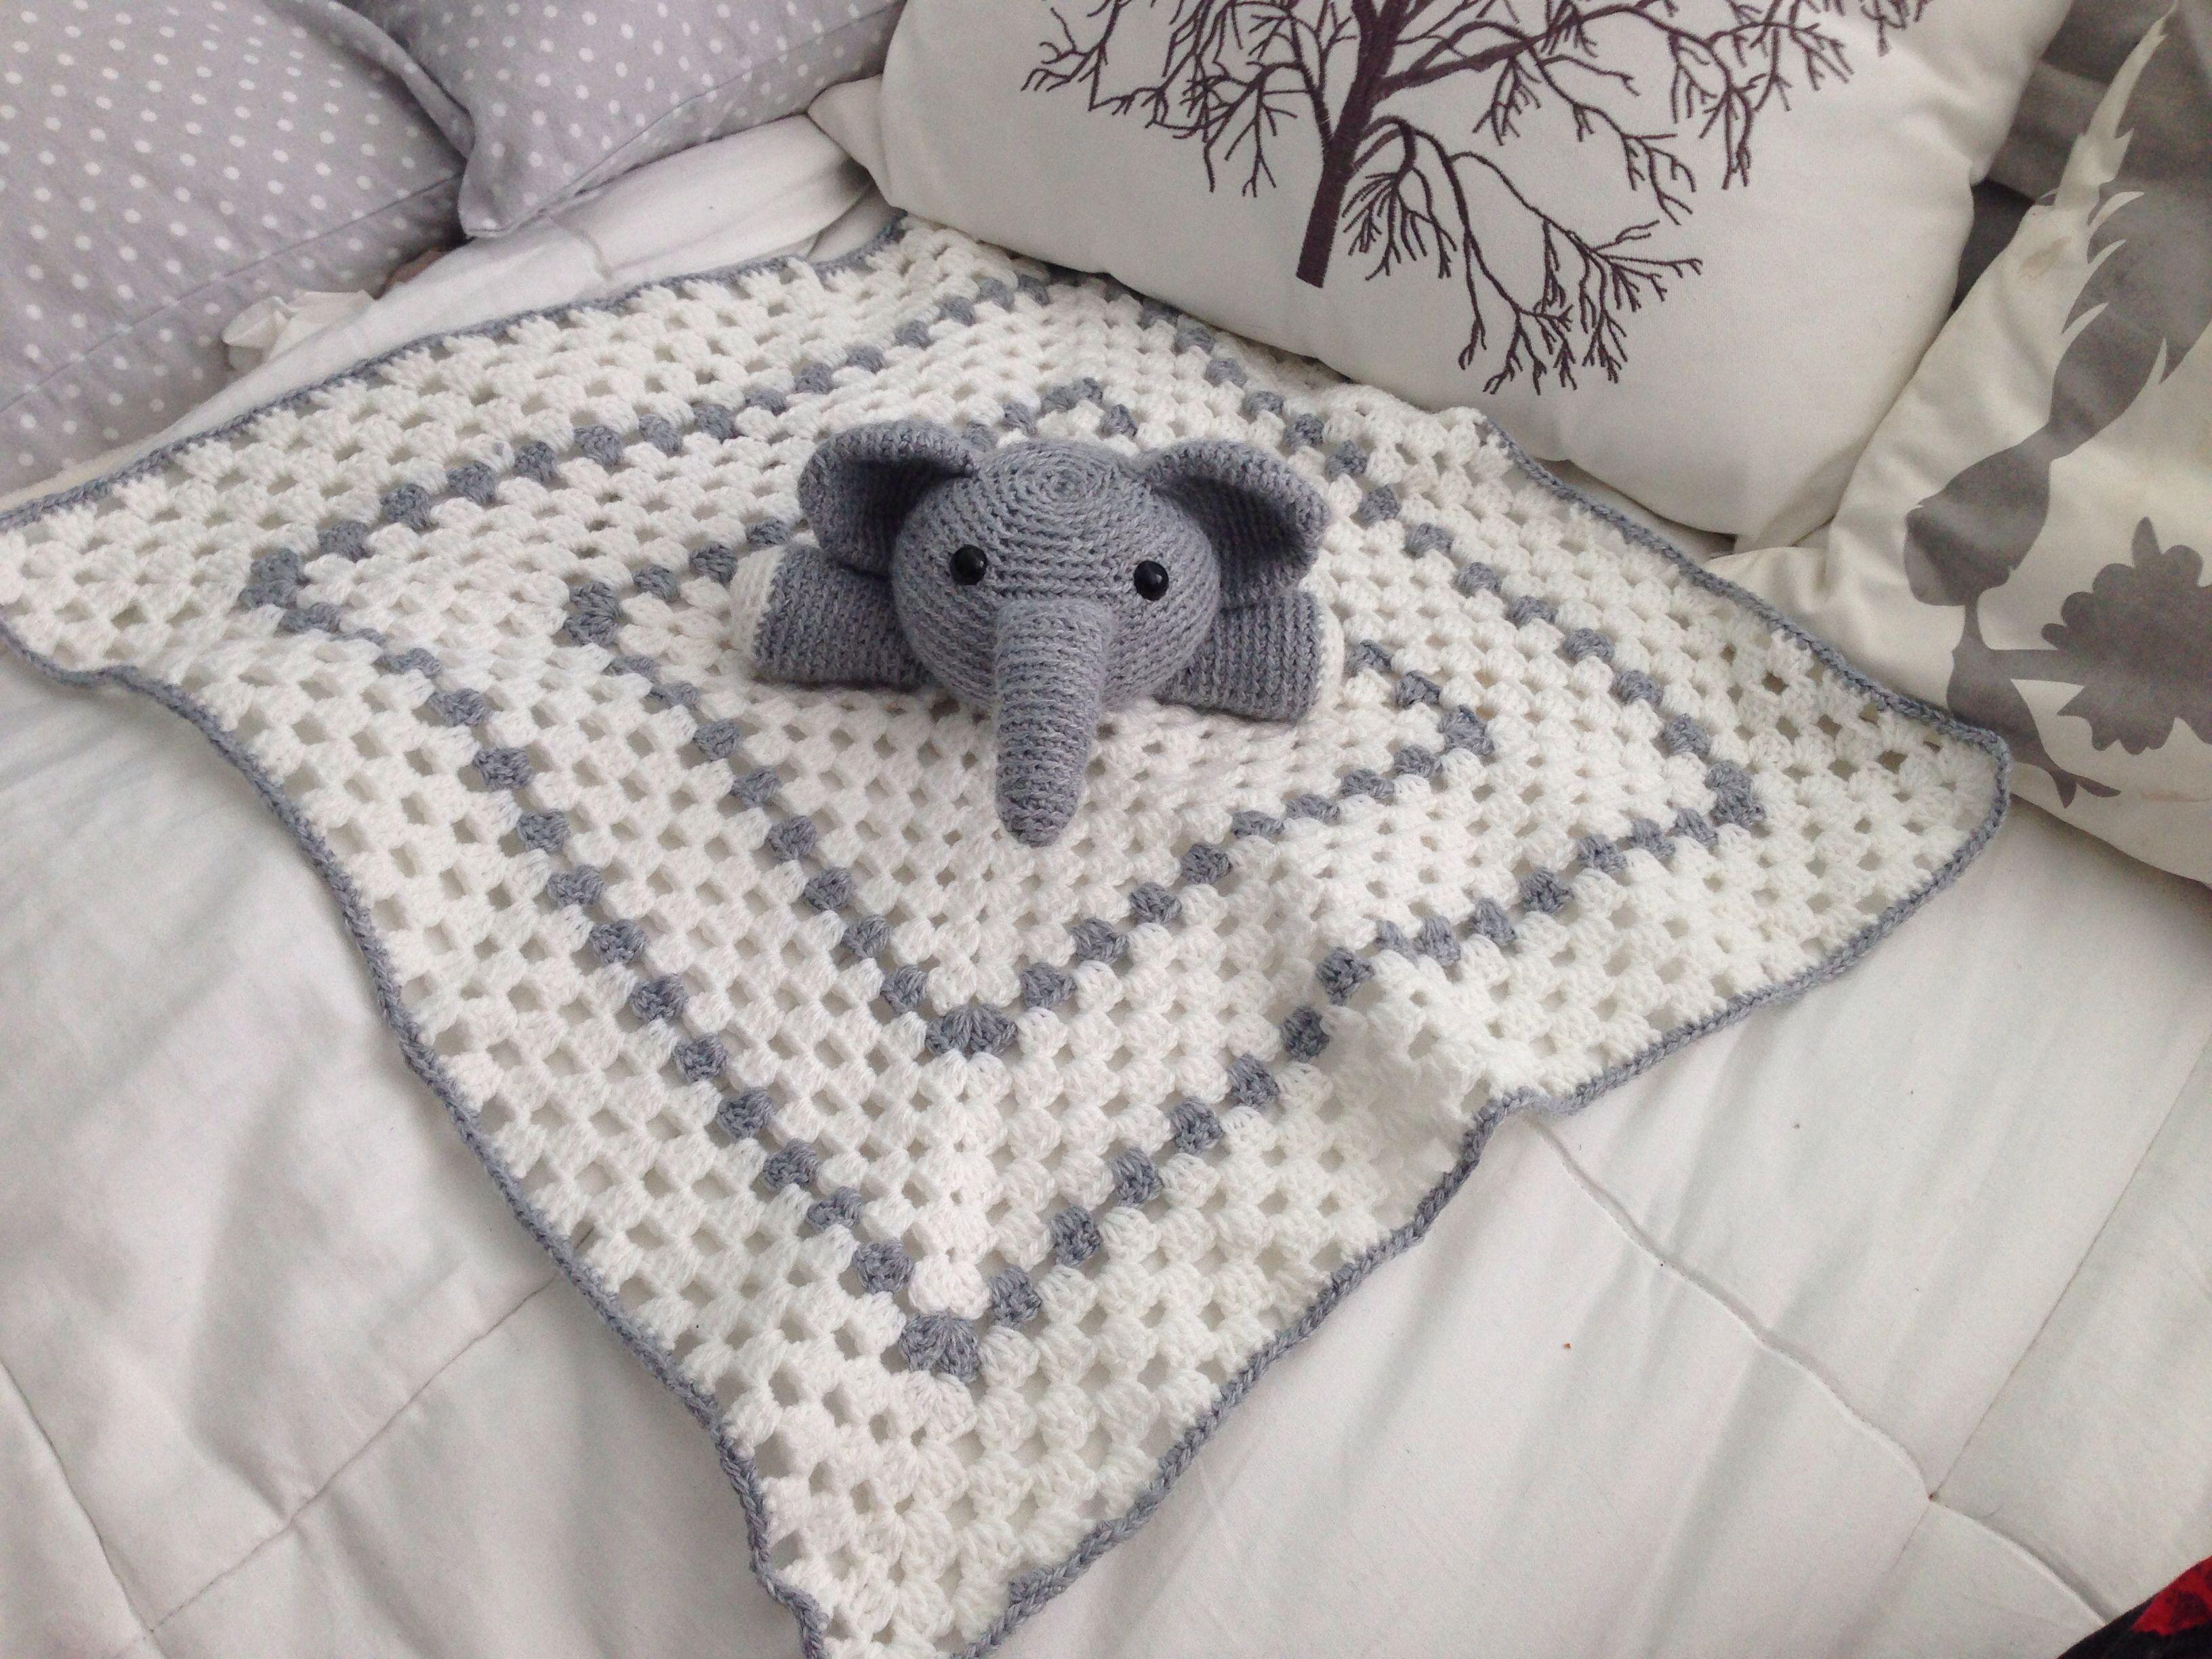 Crochet Elephant Blanket : Crochet security blanket elephant crochet & knit Pinterest